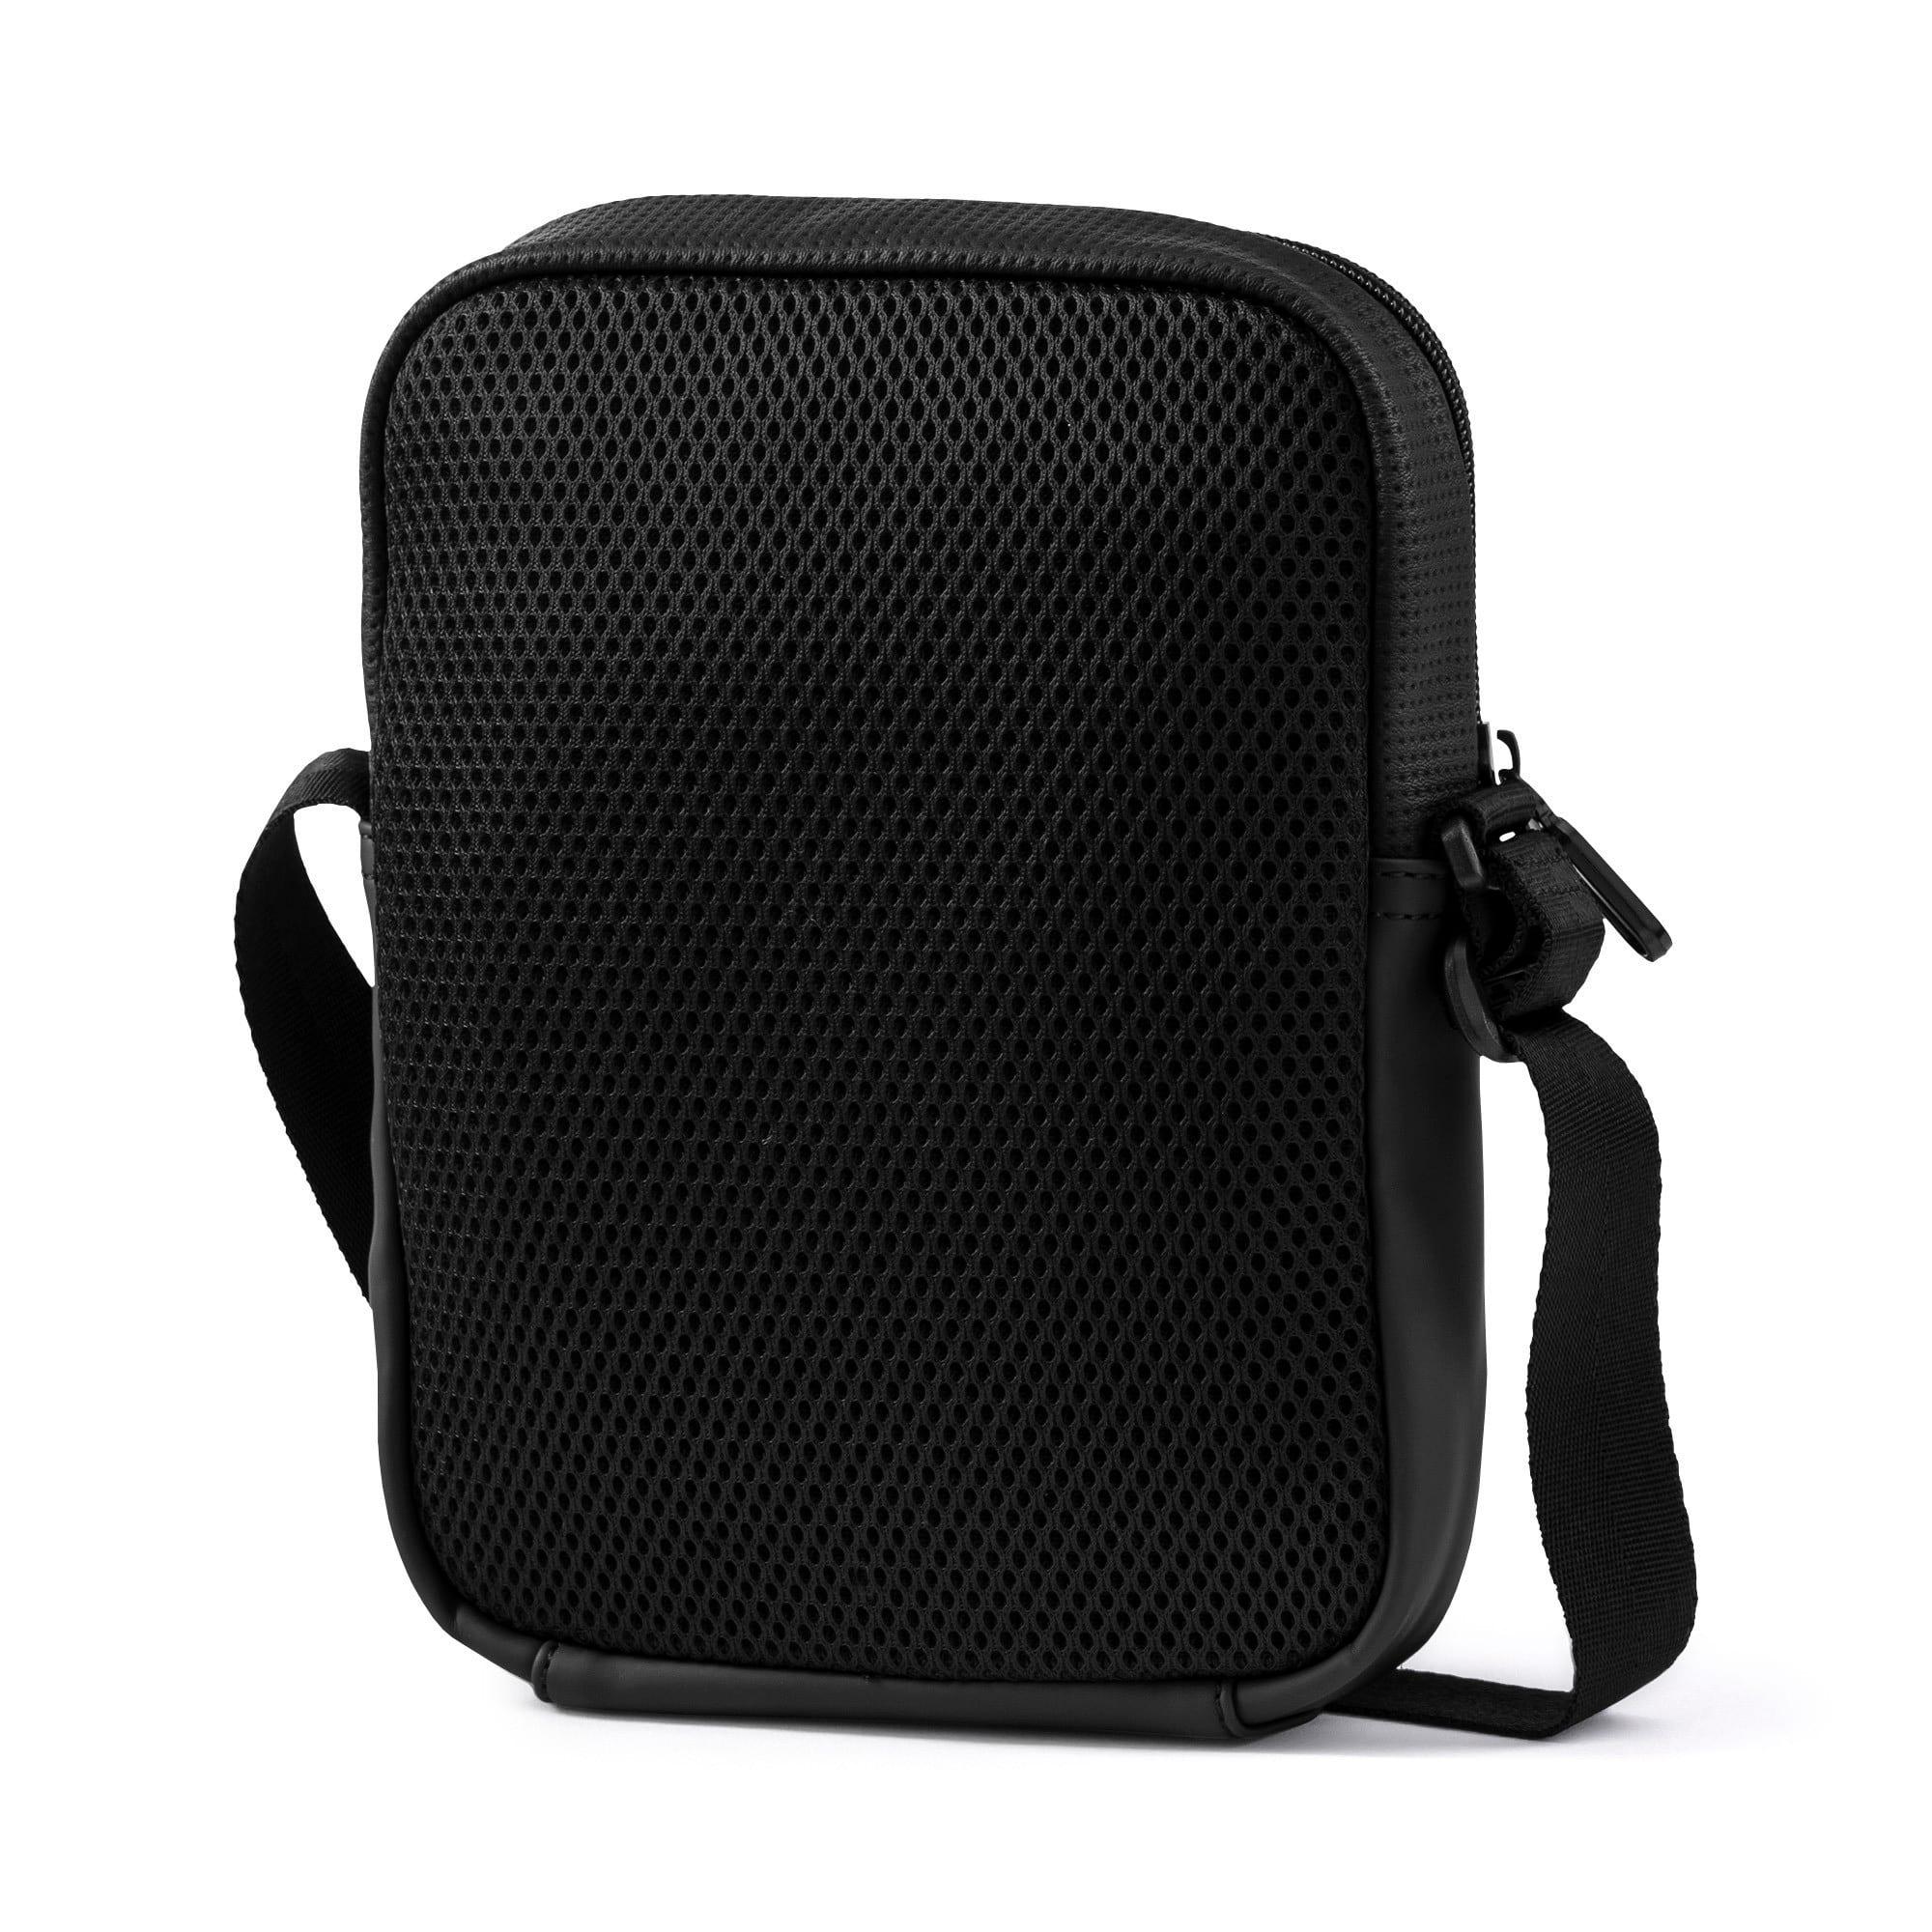 Thumbnail 3 of Ferrari Lifestyle Portable Bag, Puma Black, medium-IND